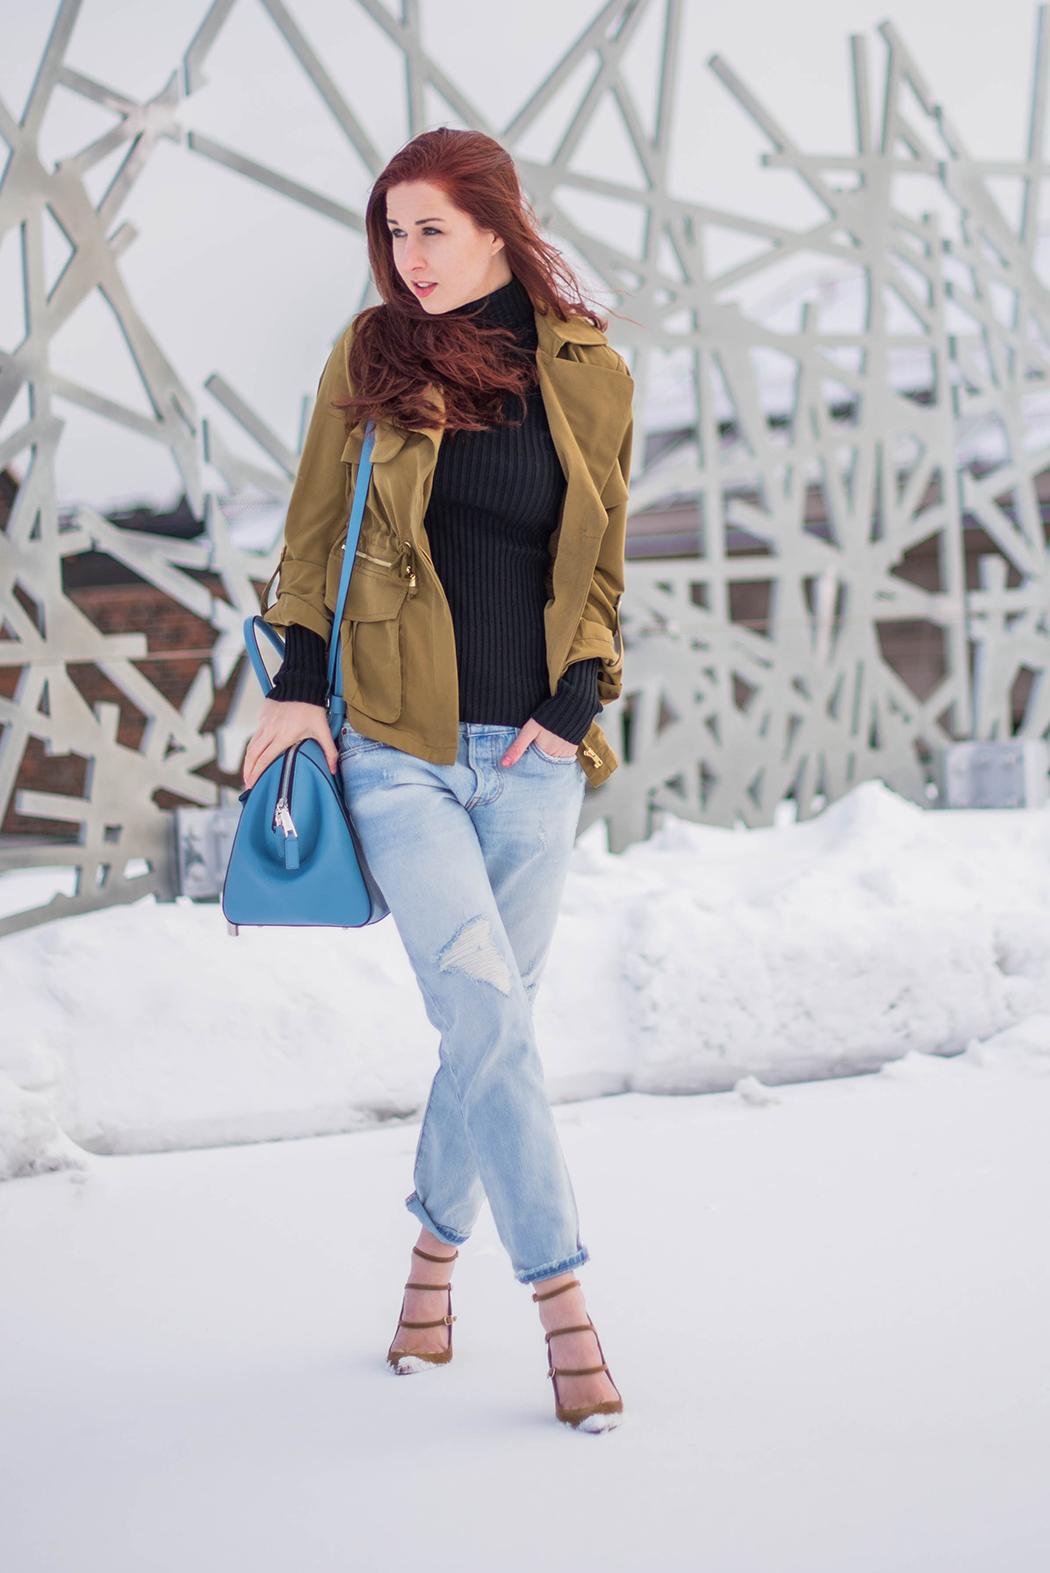 Nicholas-Kirkwood-Heels-Marc-Jacobs-Bag-Edited-Levis-Jeans-Fashionblogger-München-Deutschland-Lindarella-Fashionblog-rote-Haare-2